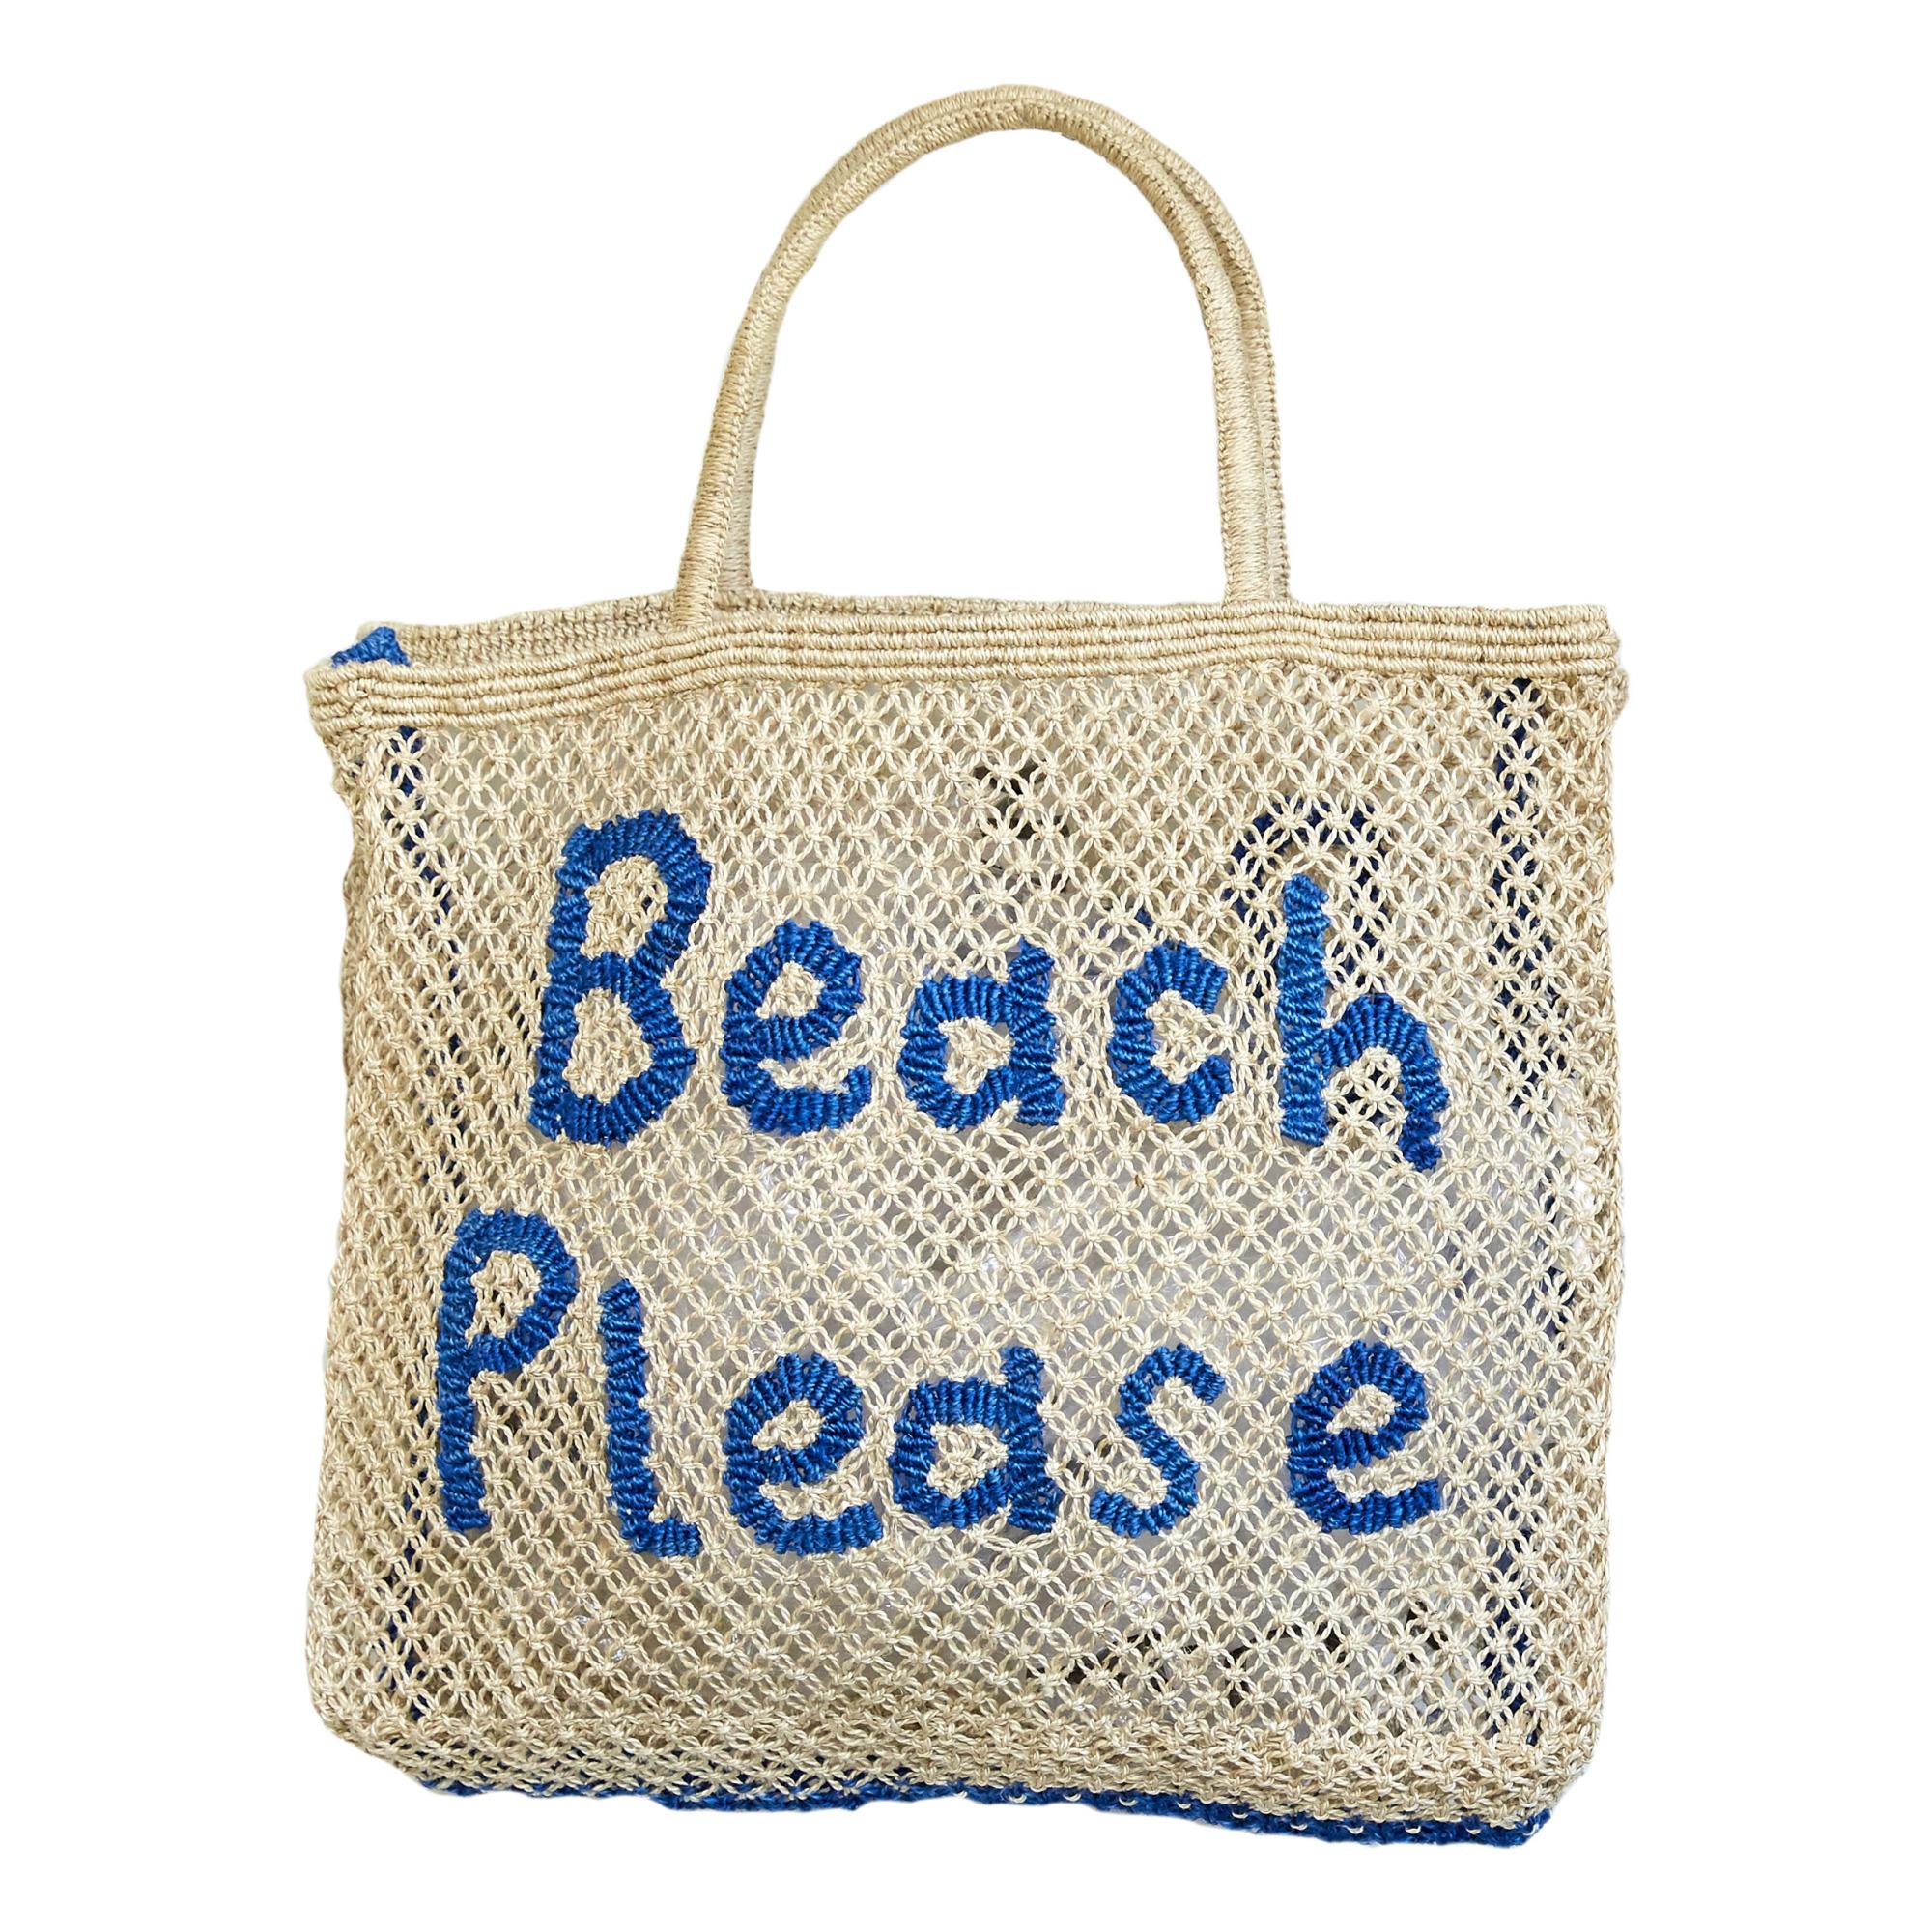 Image of Beach Please Large Basket Bag